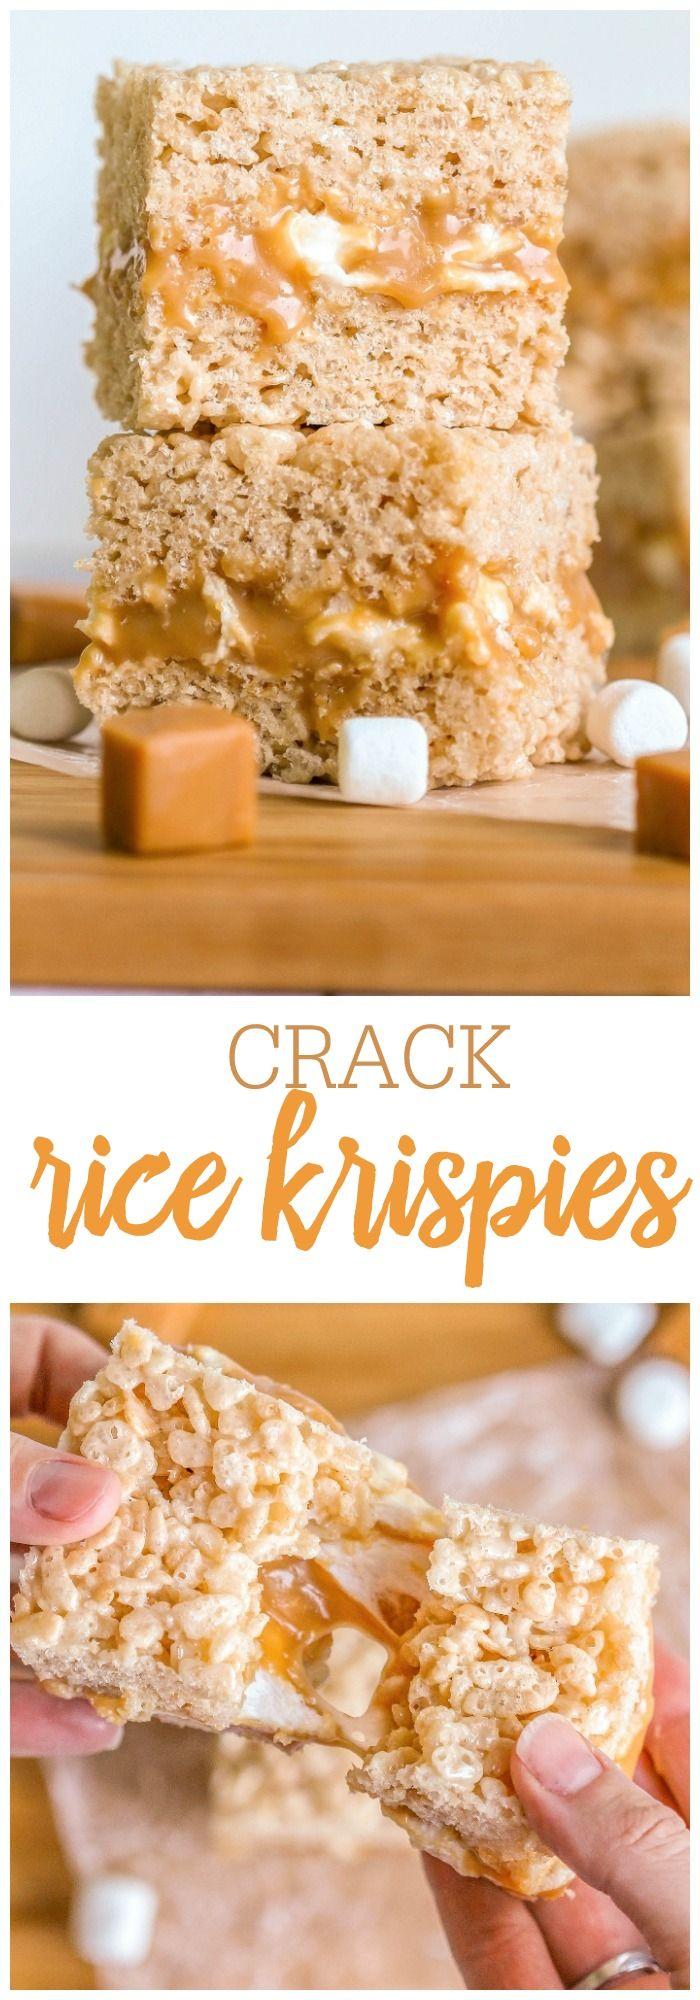 Home handmade candies chocolate dipped rice krispy treats 2 - Crack Rice Krispies